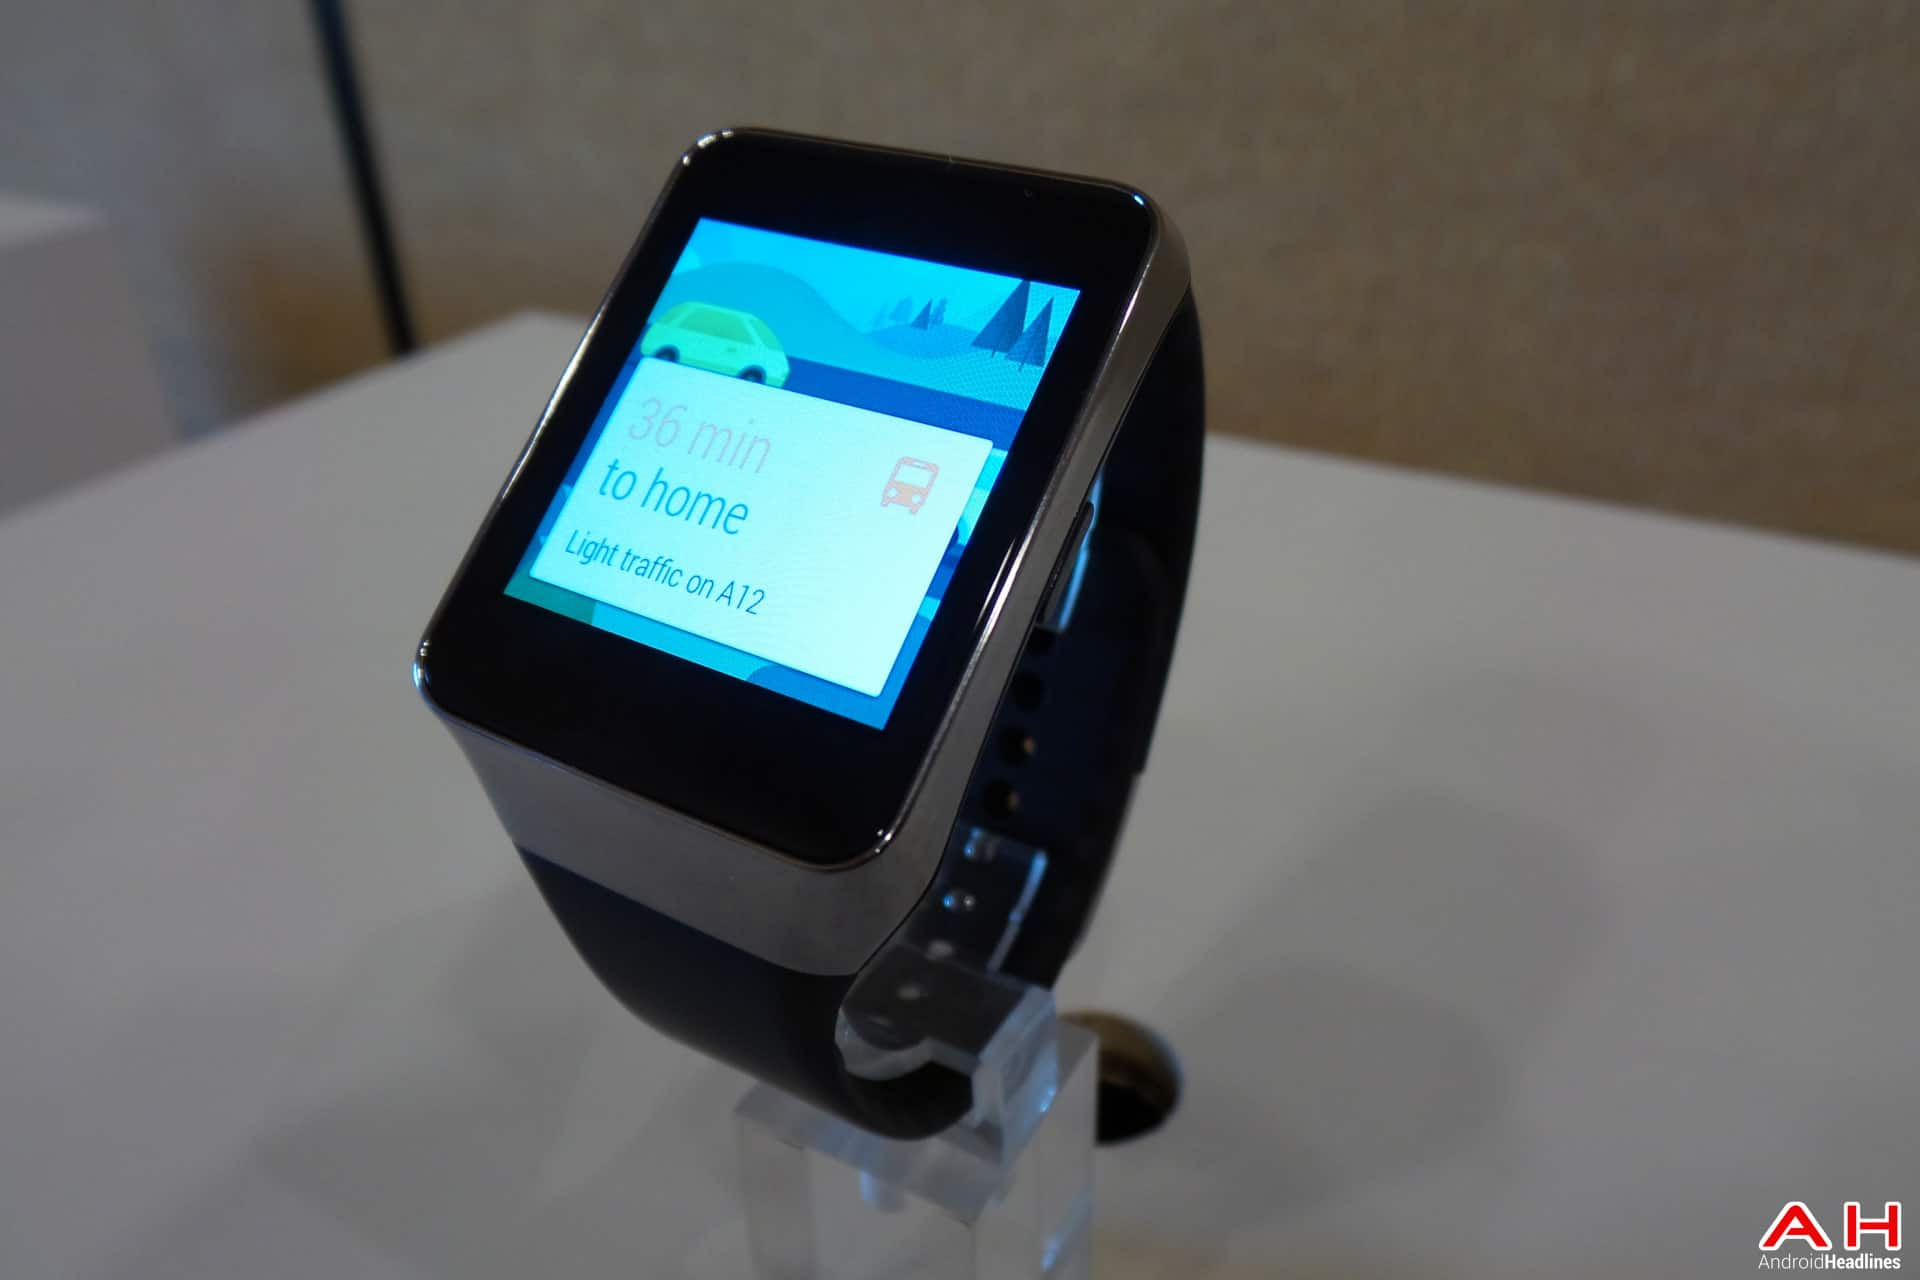 AH Google IO 2014 Galaxy Gear Live  (1 of 7)